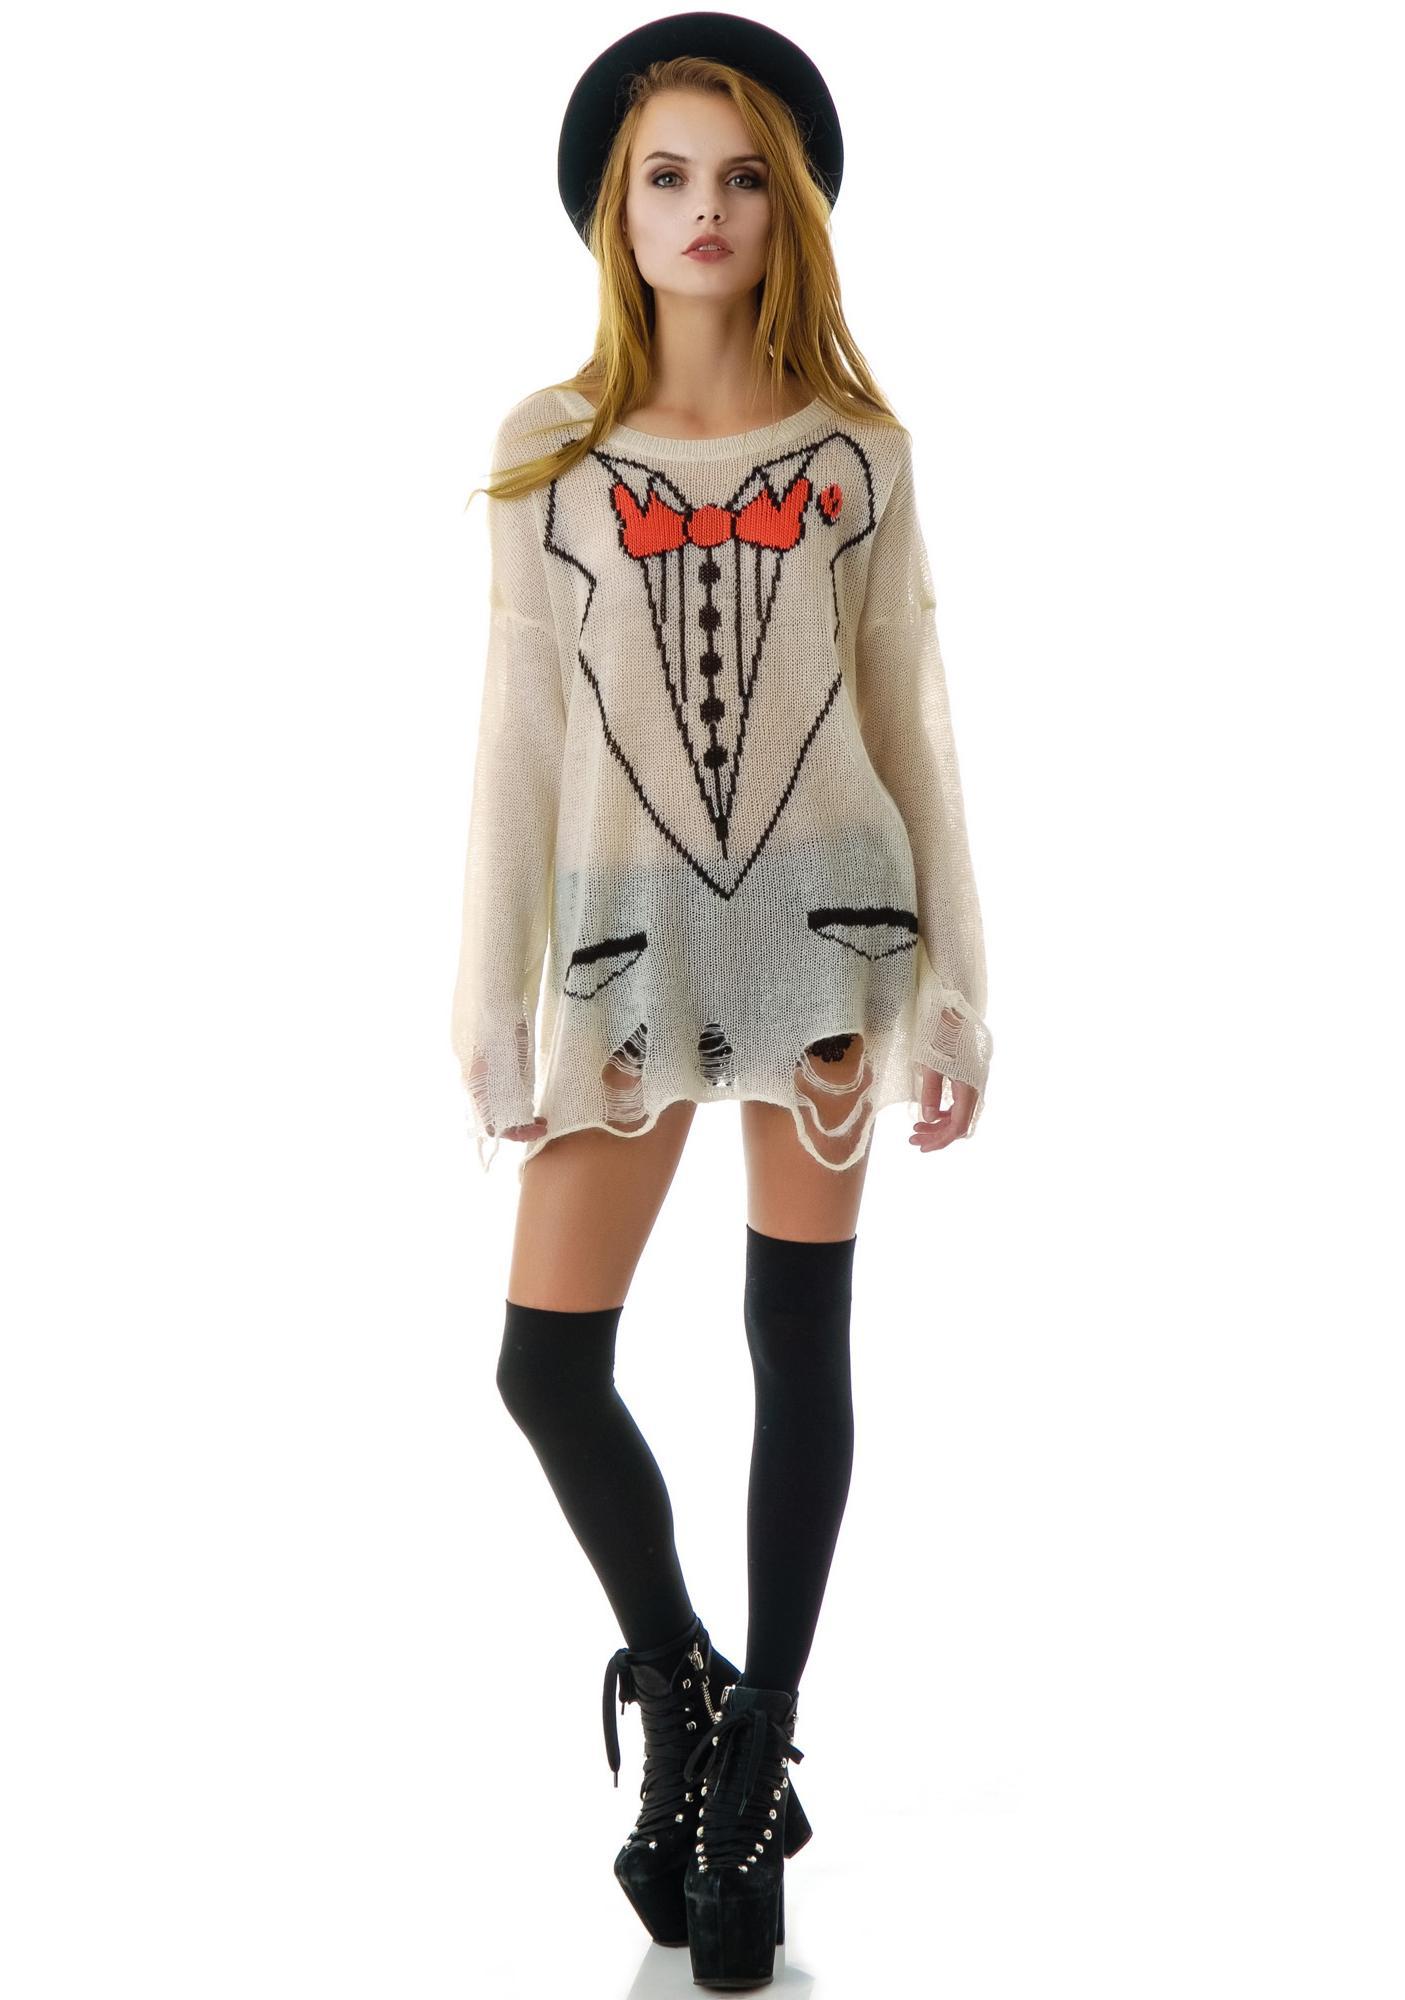 Wildfox Couture Sinatra Lennon Sweater